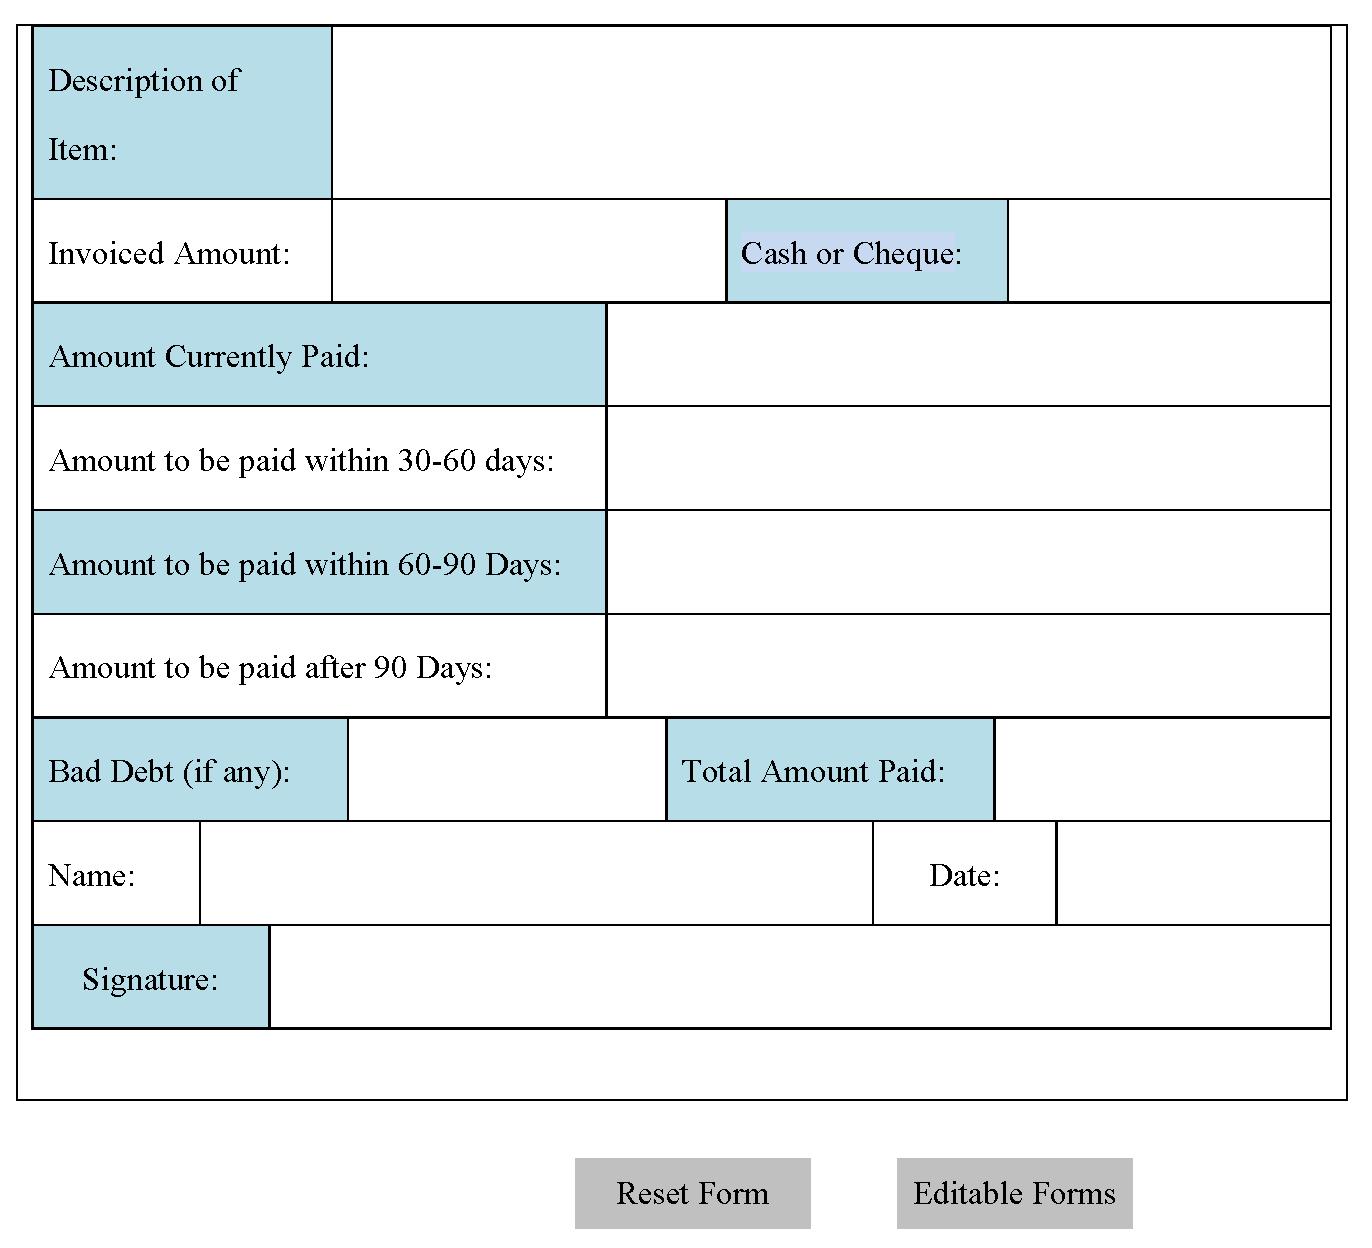 Accounts Payable Form